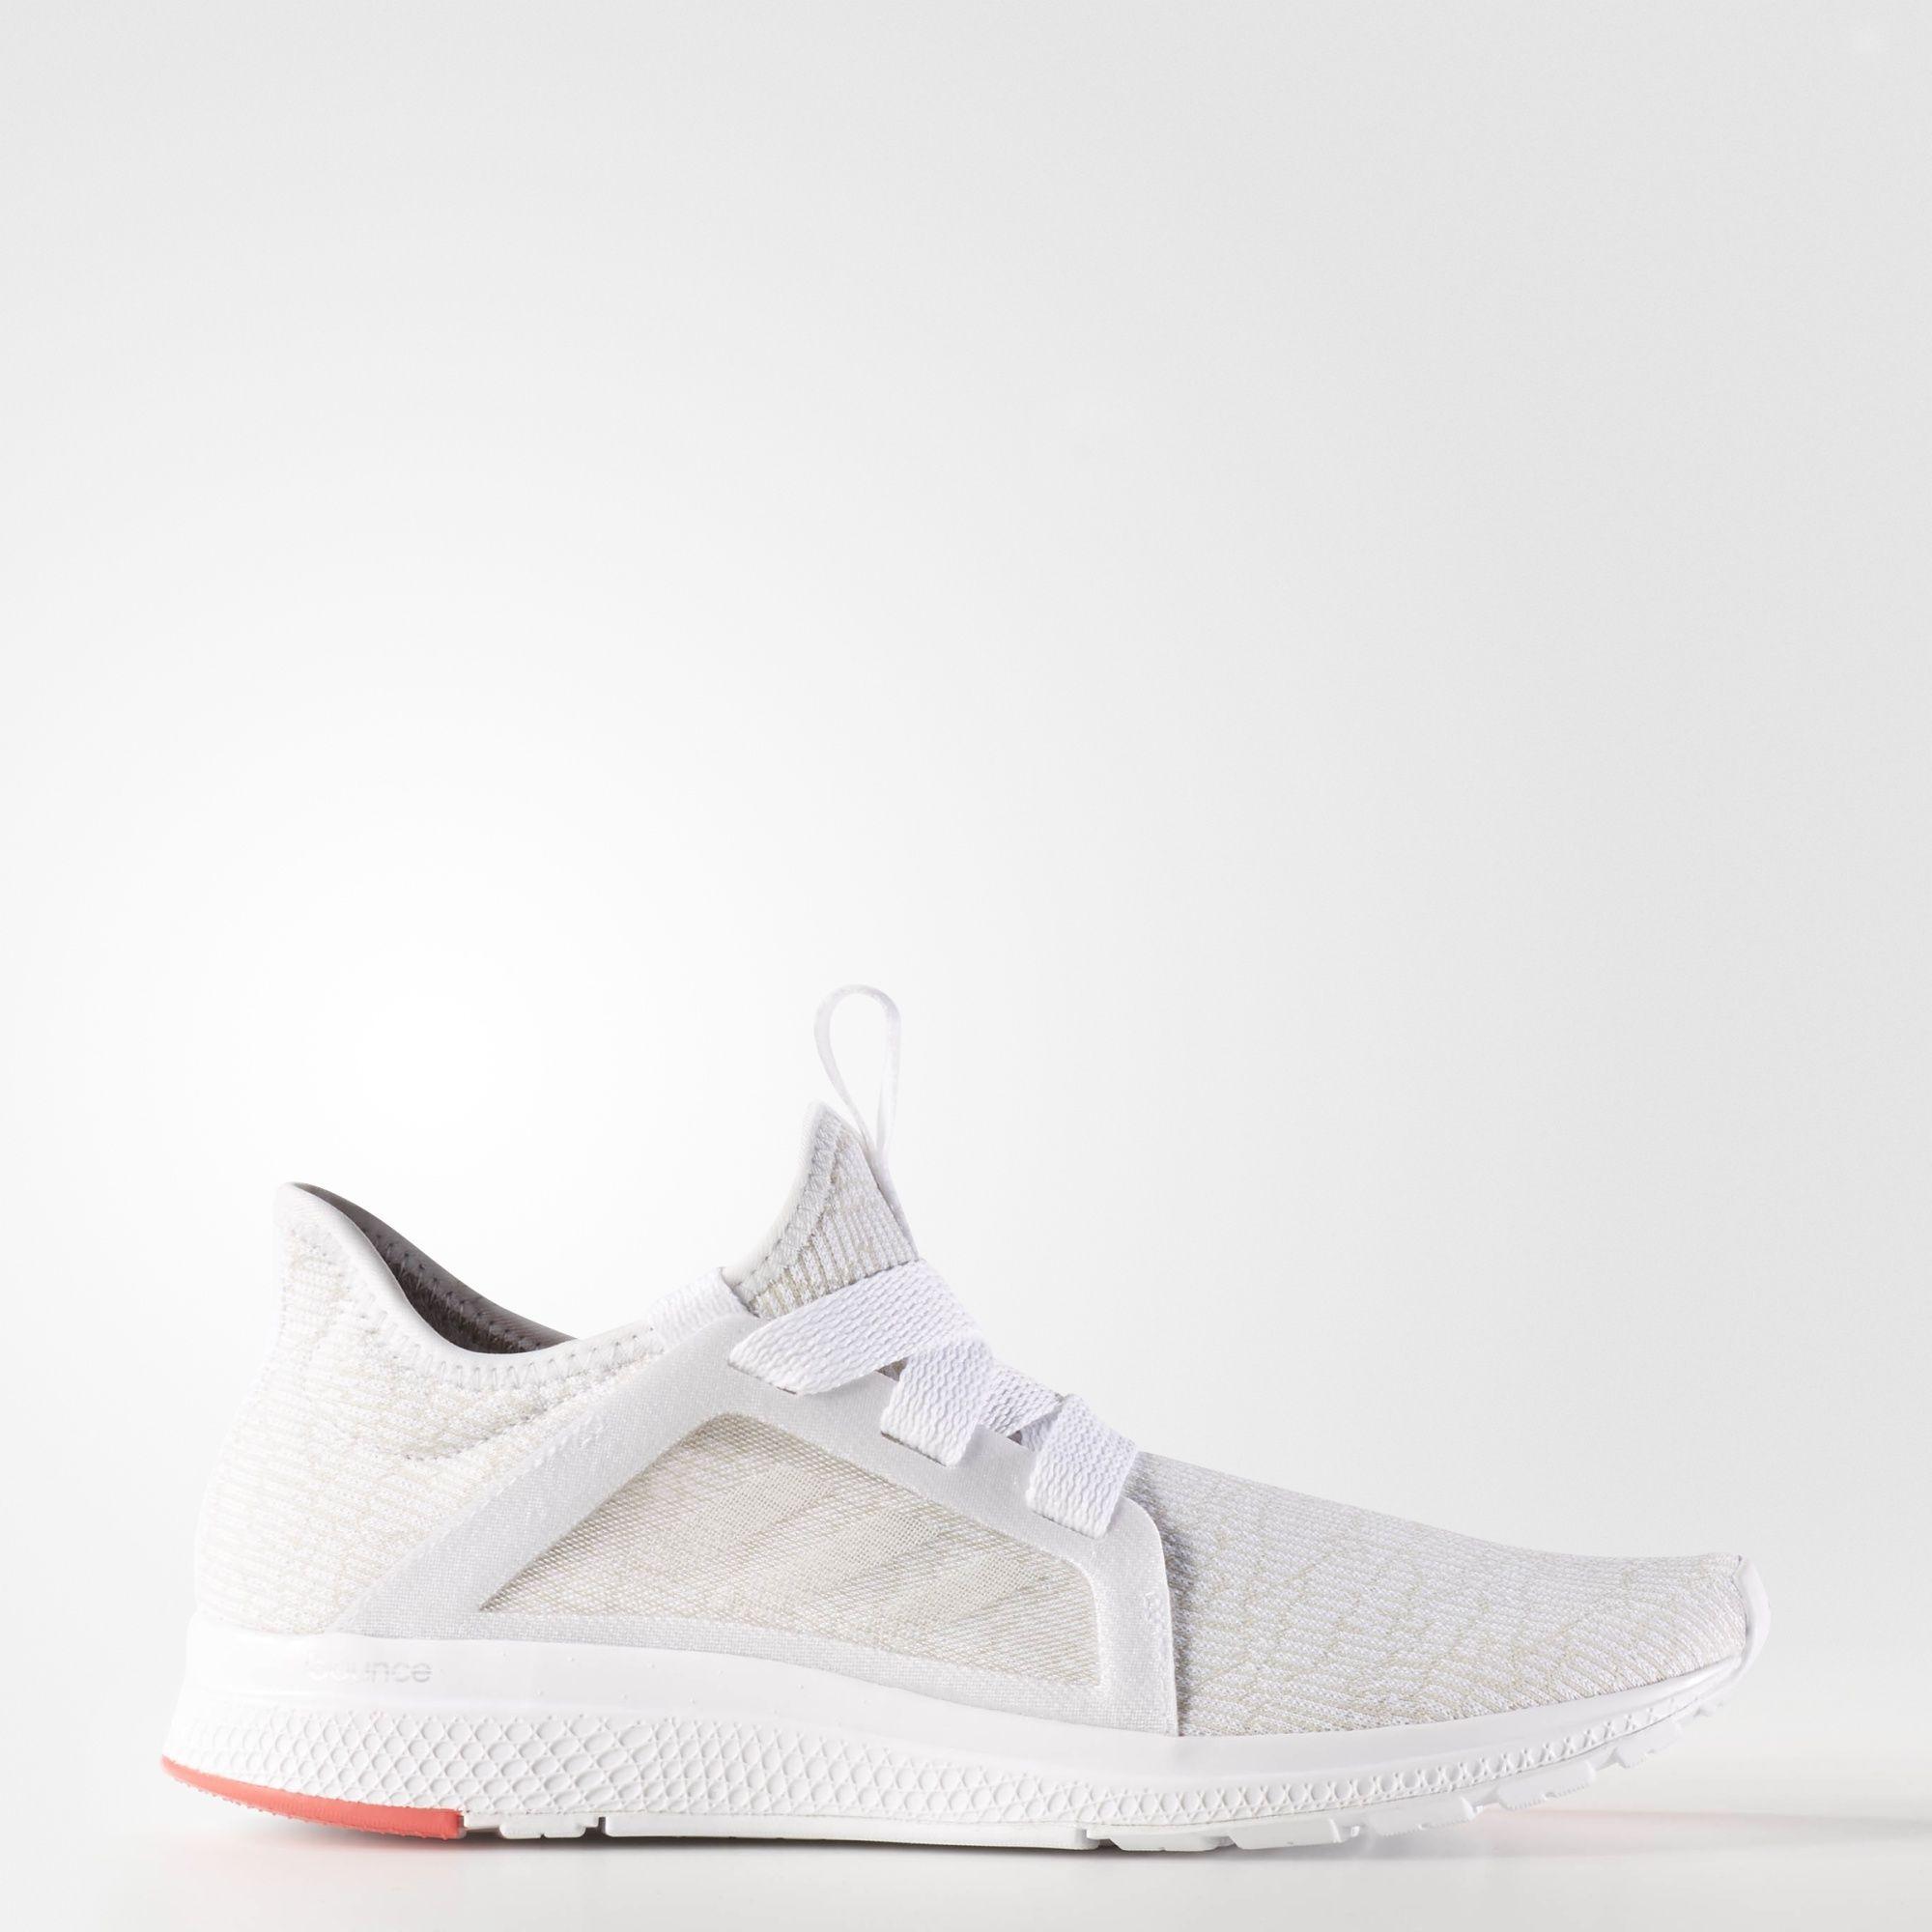 kids adidas shoes nike shoes in twos lyrics a-z motorsport 90496